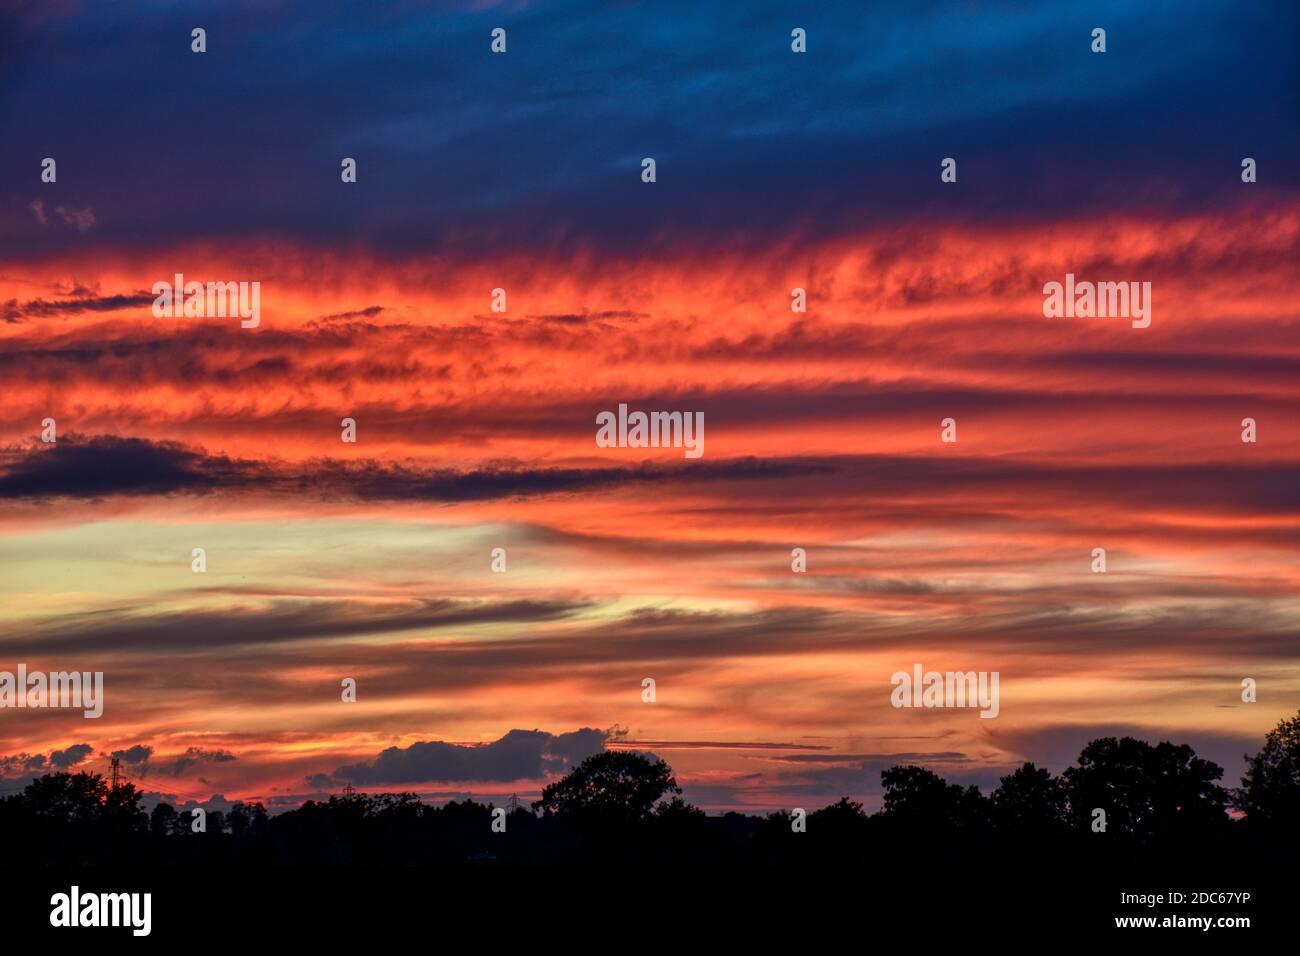 Wolkendecke, Sonnenuntergang, Sonnenaufgang, Abendrot, Morgenrot, Dämmerung, Abenddämmerung, Morgendämmerung, Himmel, Wolken, leuchten, Strahlen, Blau Stock Photo